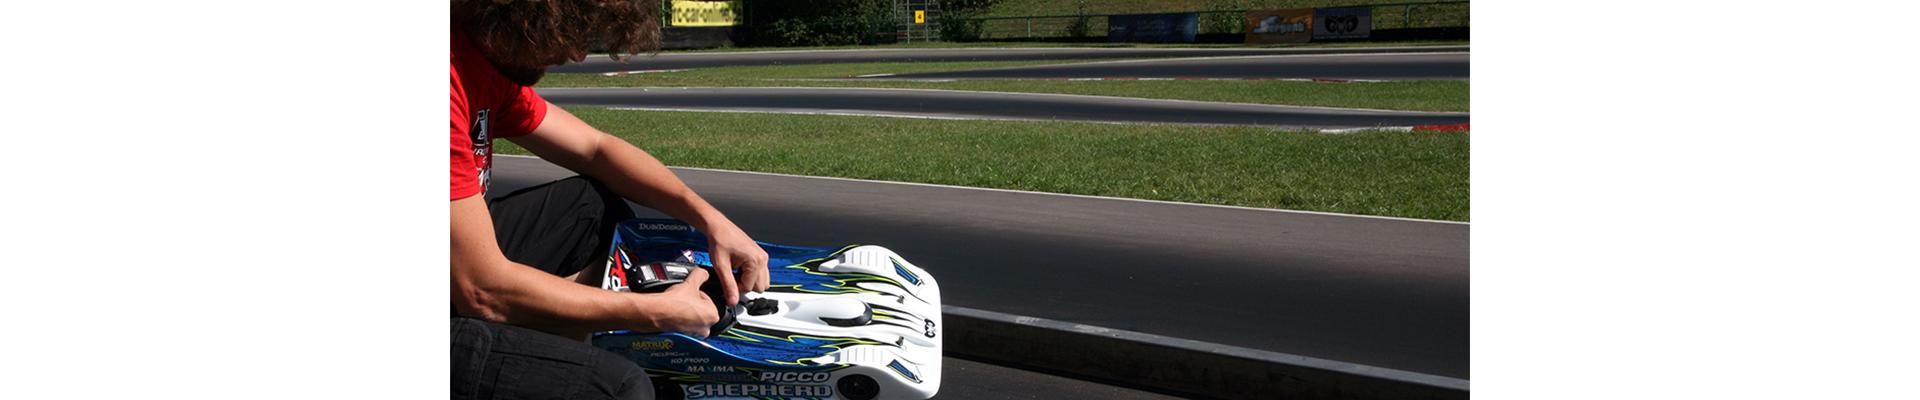 Micro racing punktgenaue temperaturkontrolle